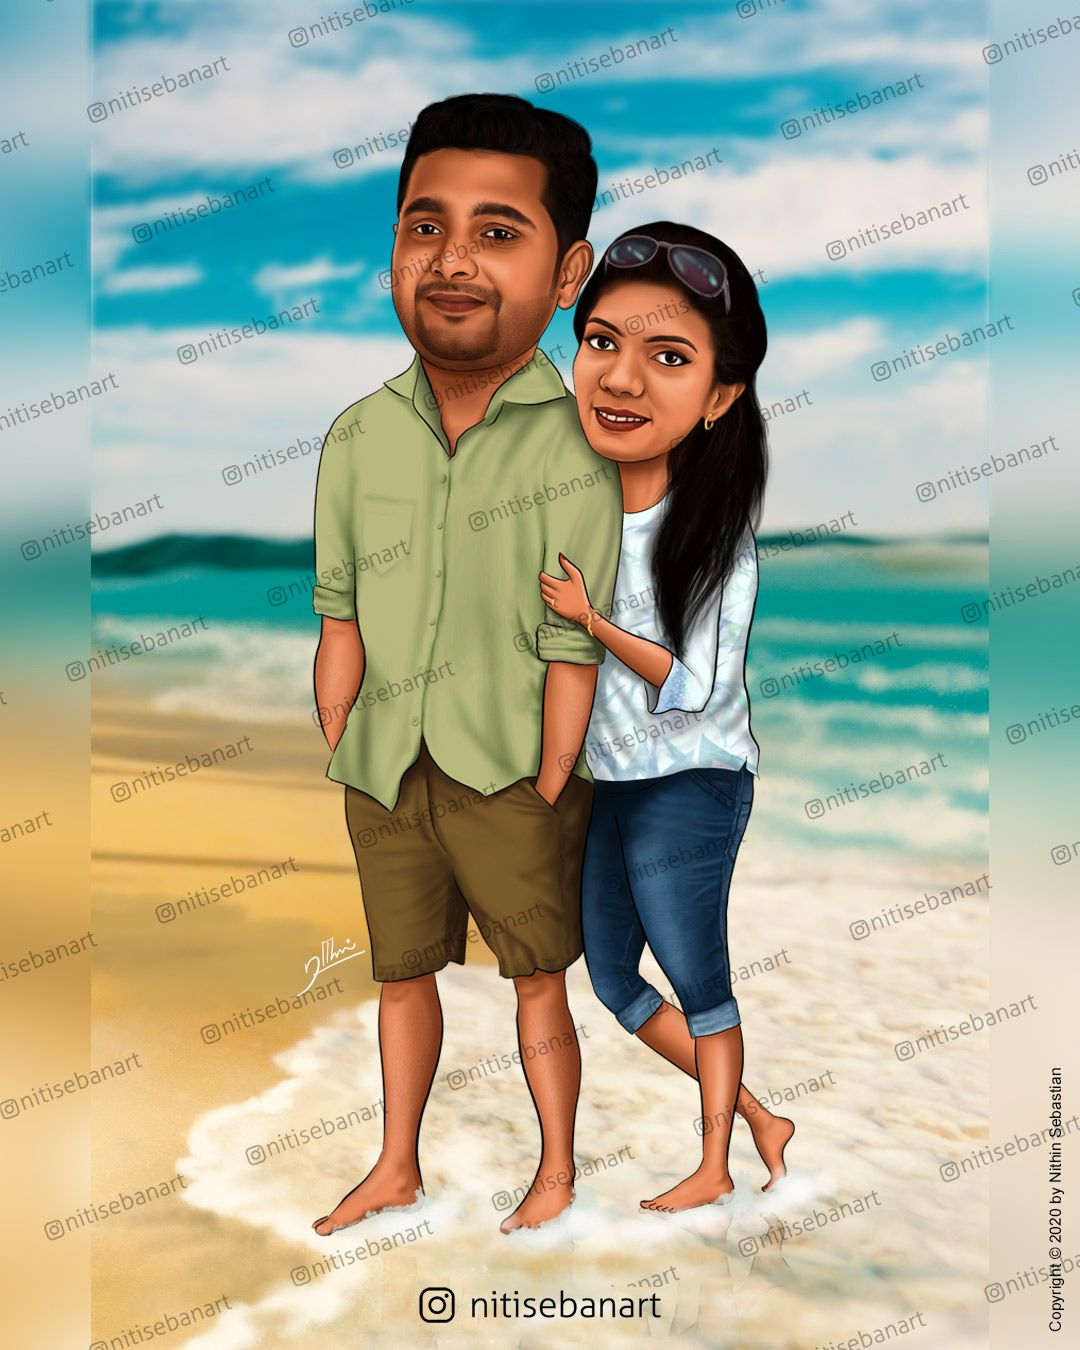 Romantic Couple Caricature Wedding Couple Cartoon Wedding Caricature Caricature Wedding